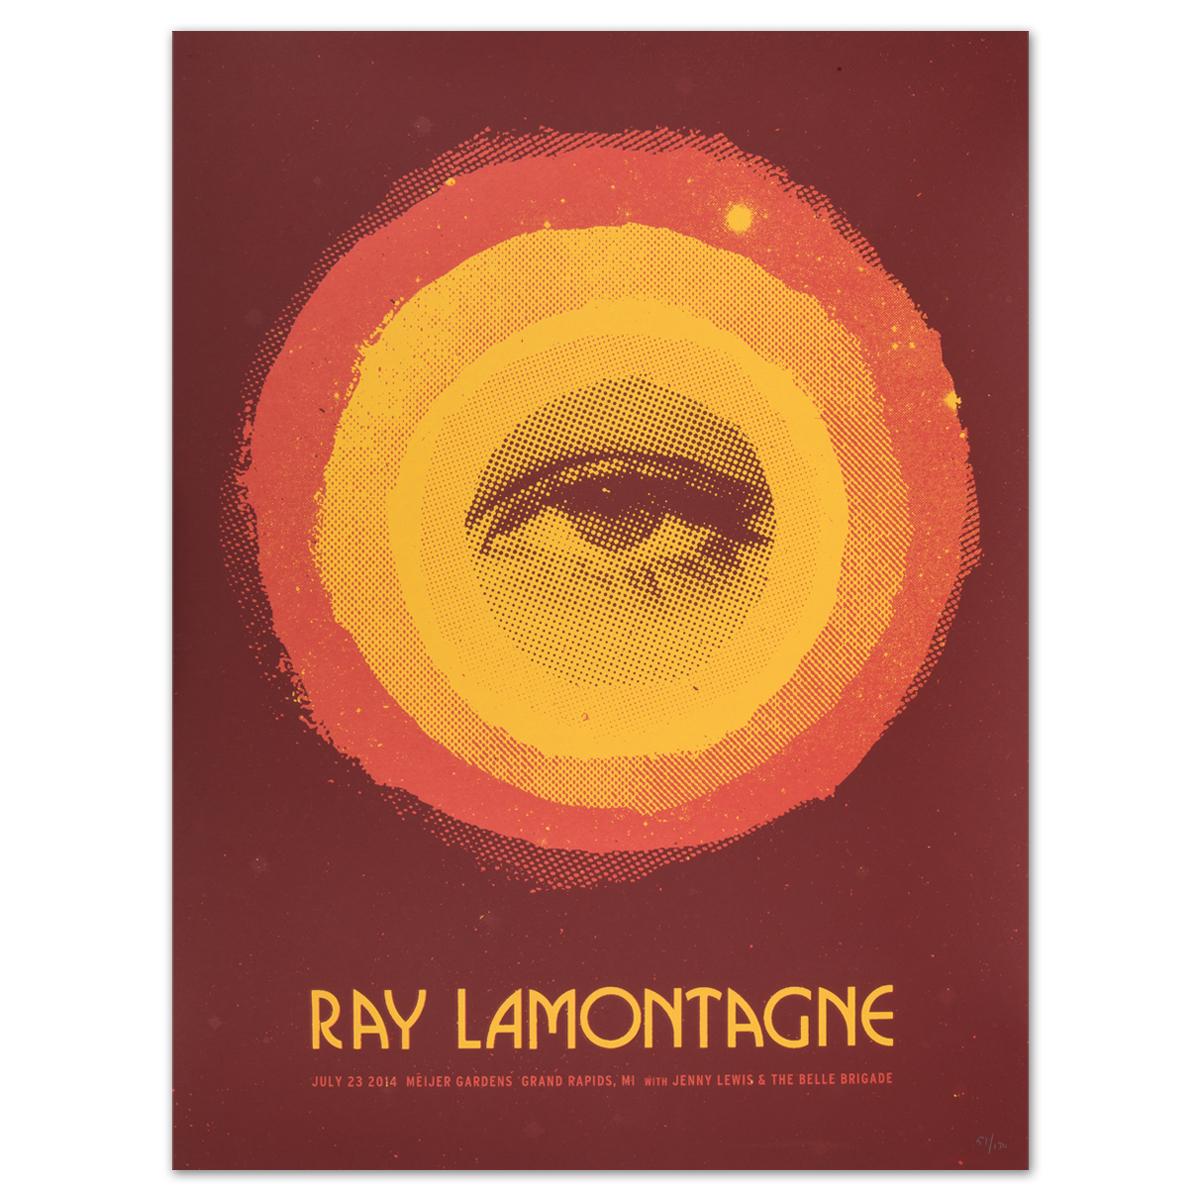 Ray LaMontagne 2014 Grand Rapids, MI Event Poster